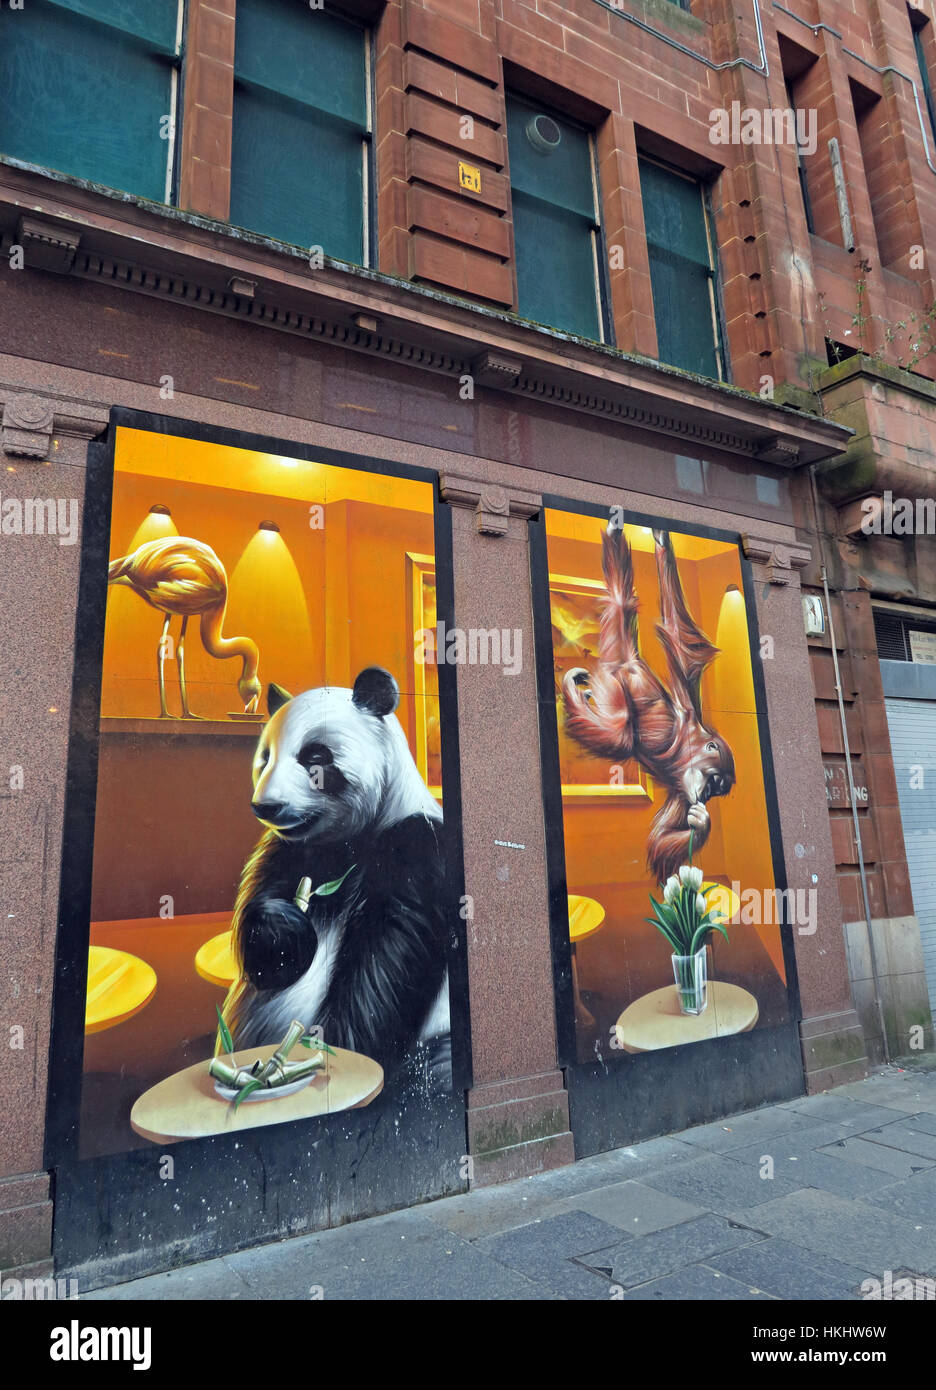 gotonysmith,window,Pandas,front,painting,hoarding,Empty,Empty